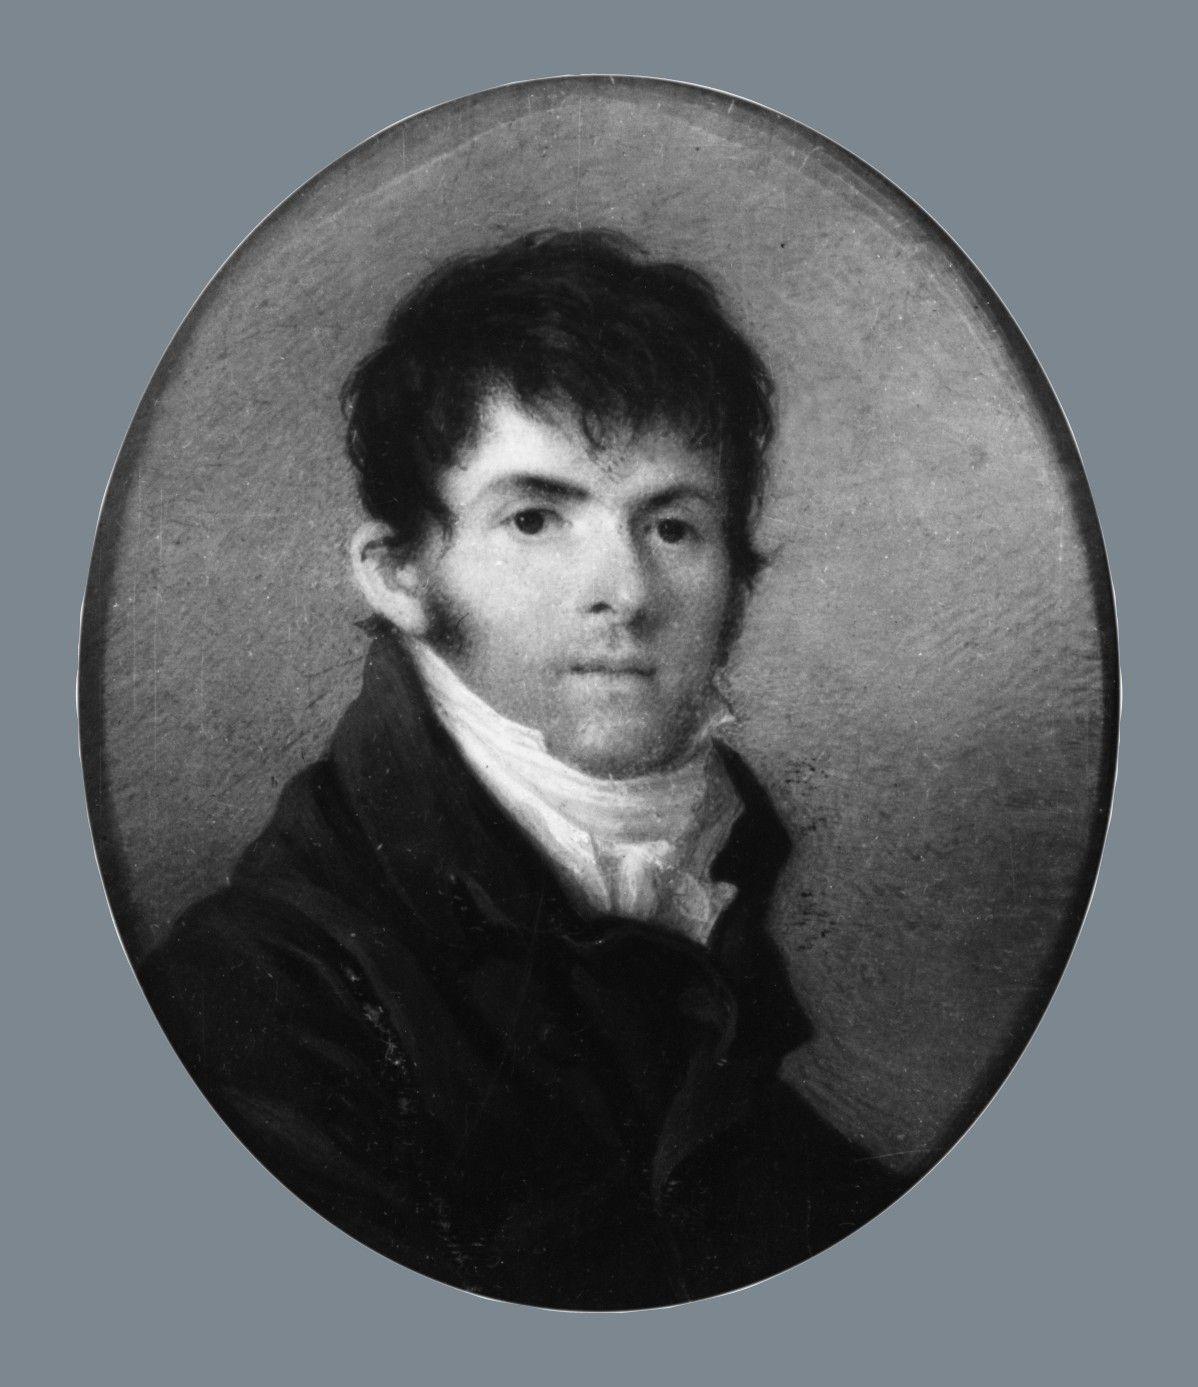 Joseph Dugan by Joseph Wood